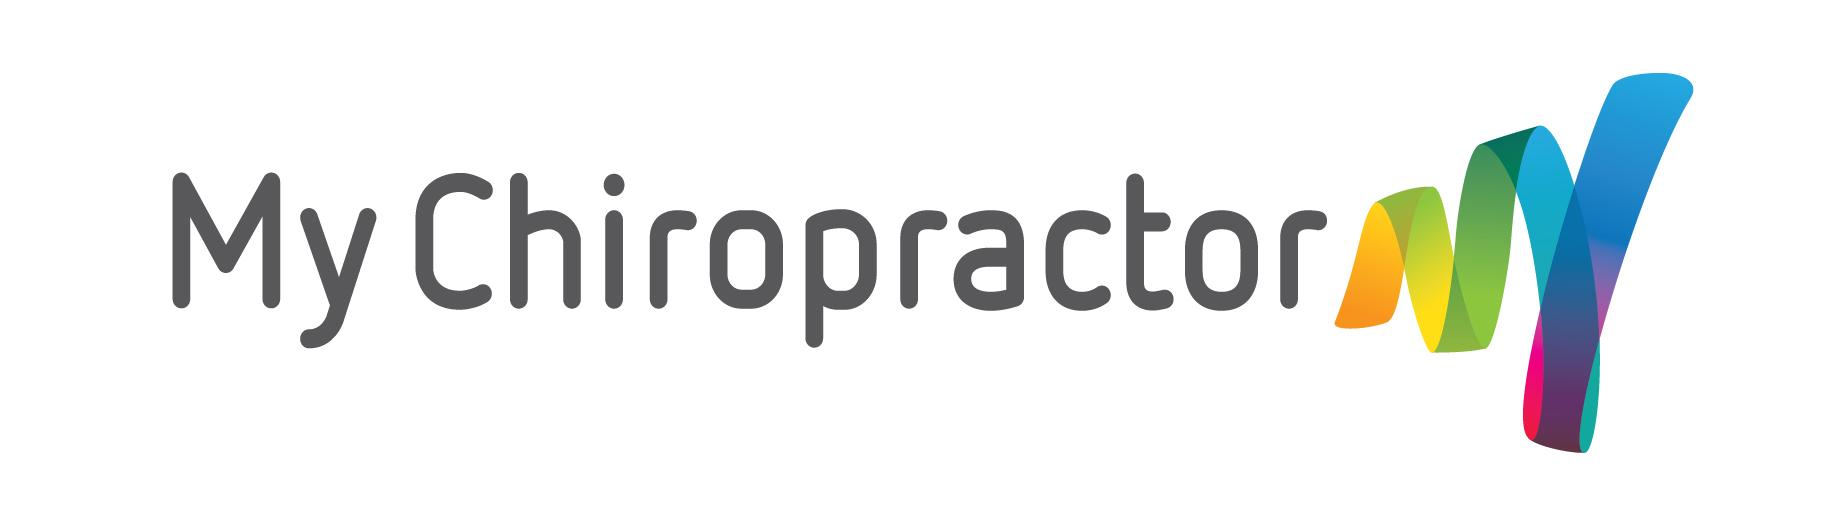 my-chiropractor